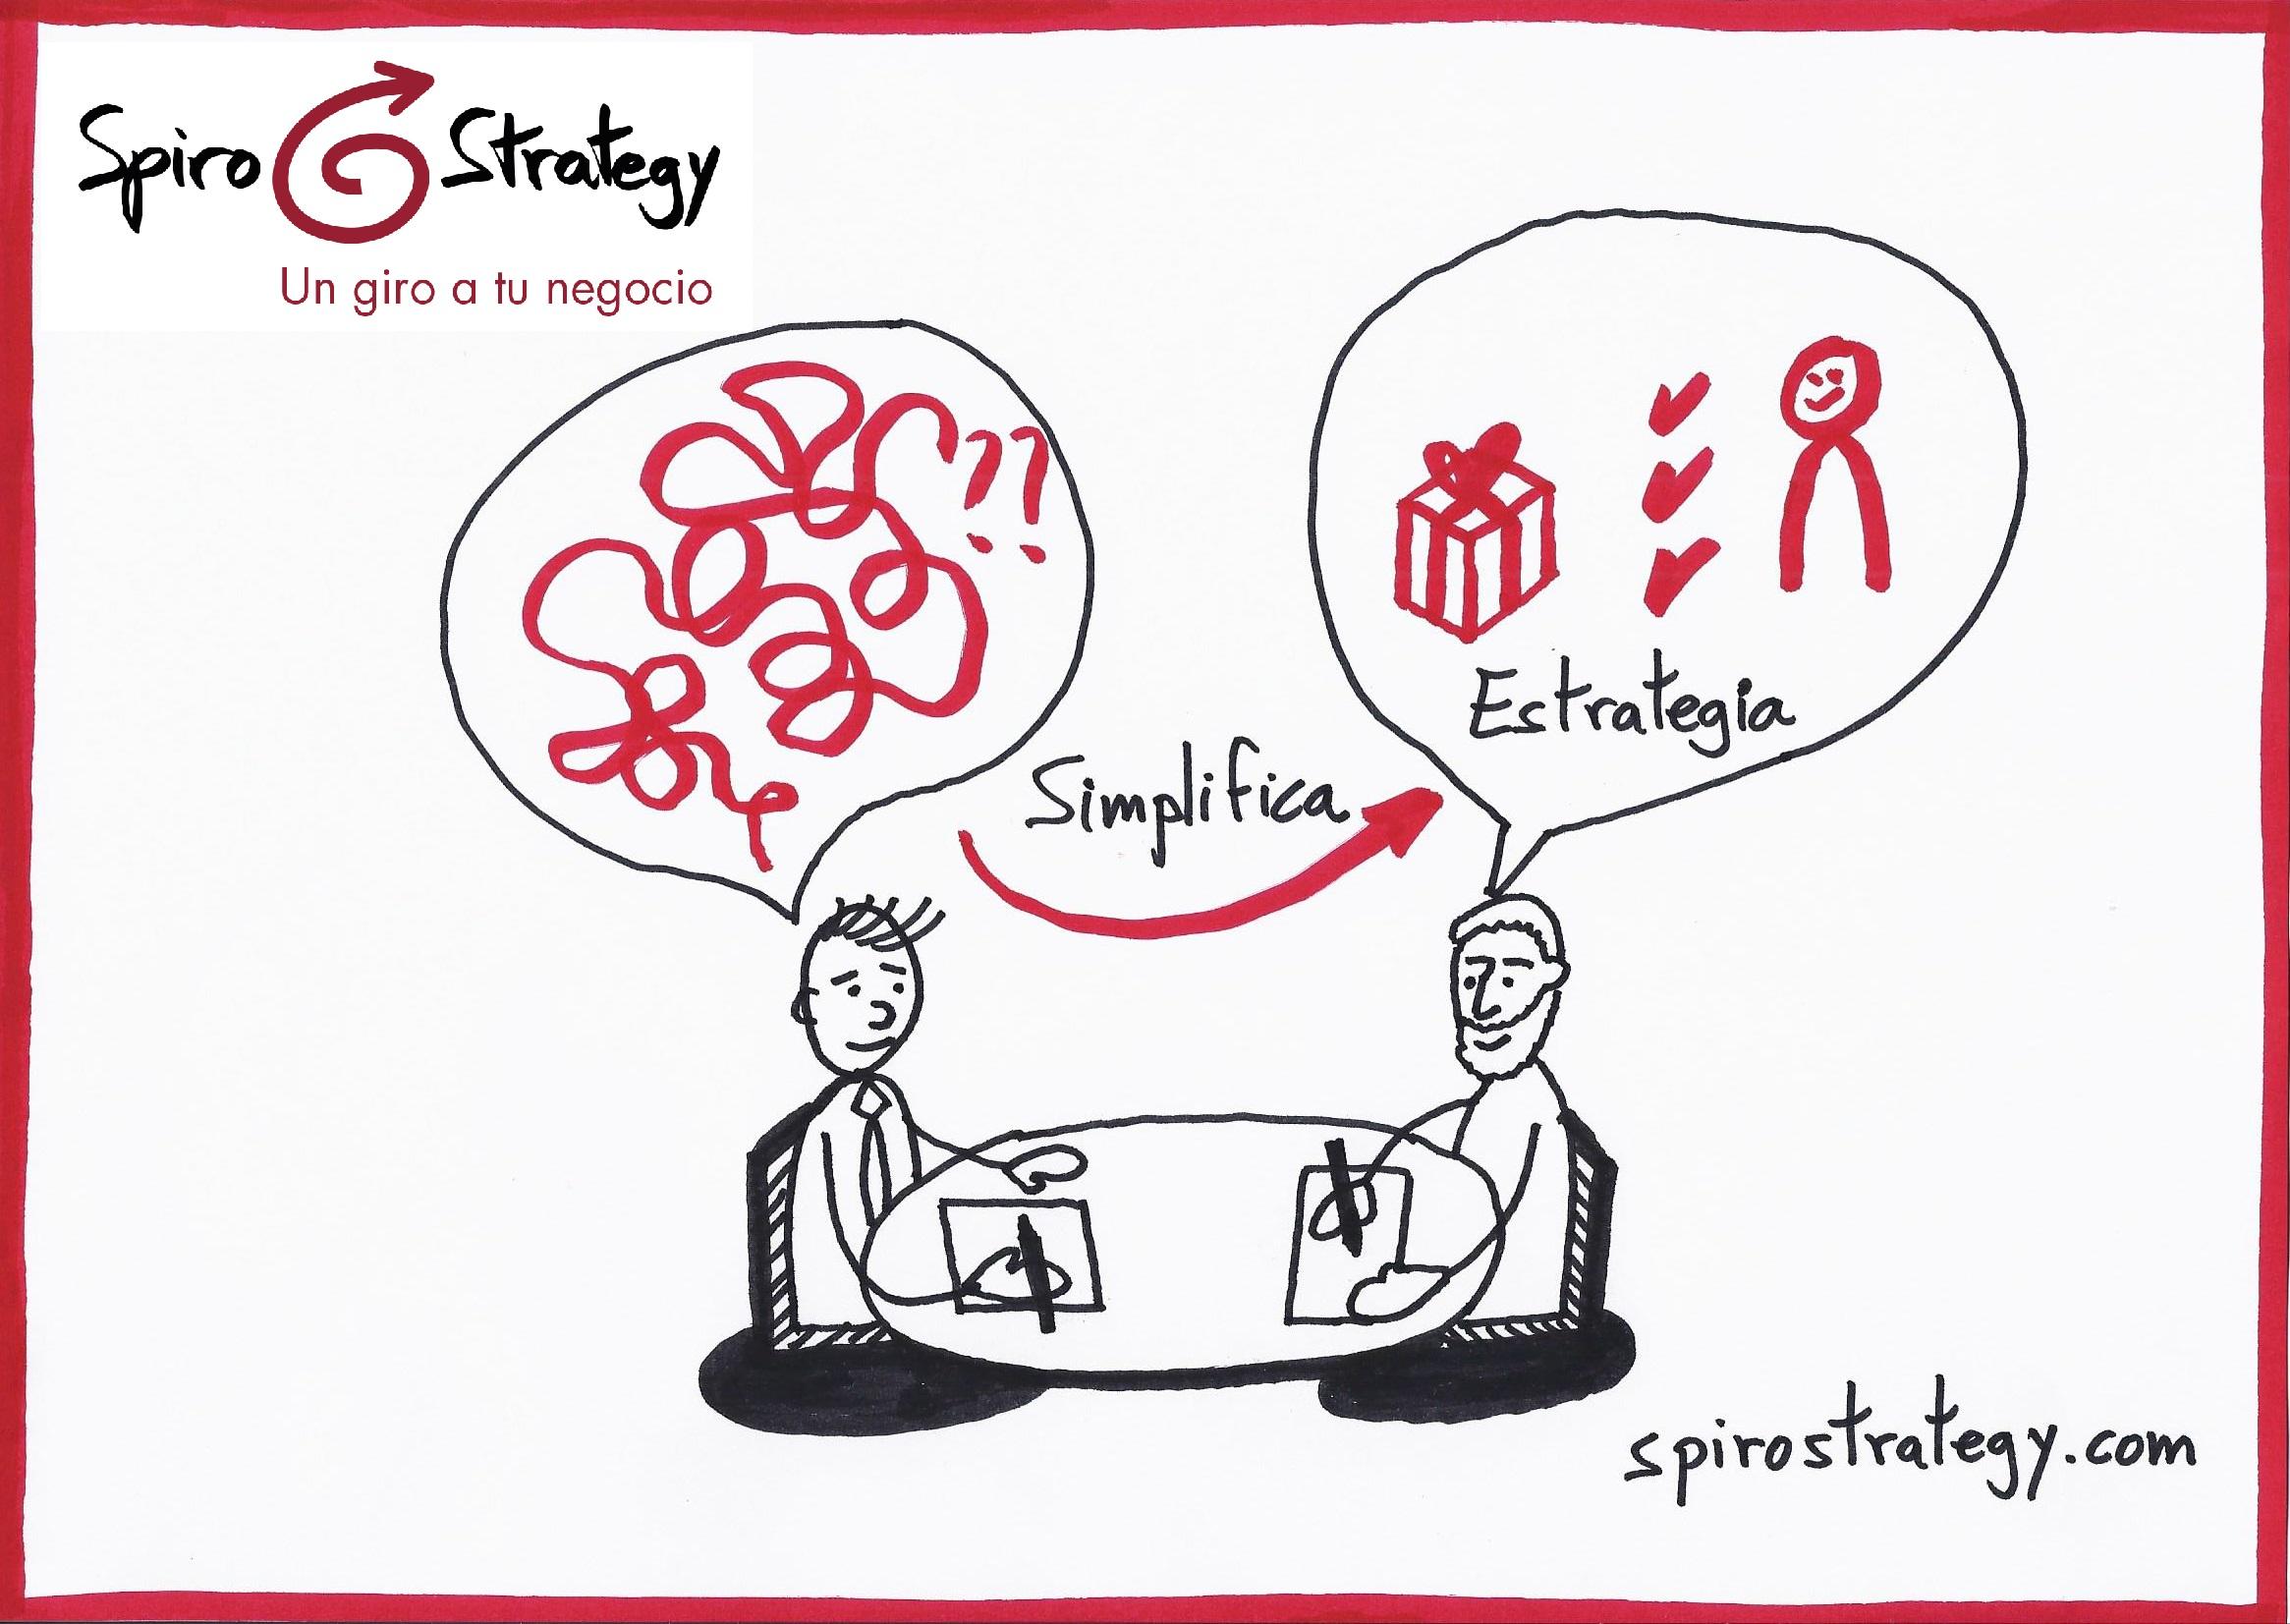 Simplifica tu estrategia: «La sencillez es sofisticada». Steve Jobs